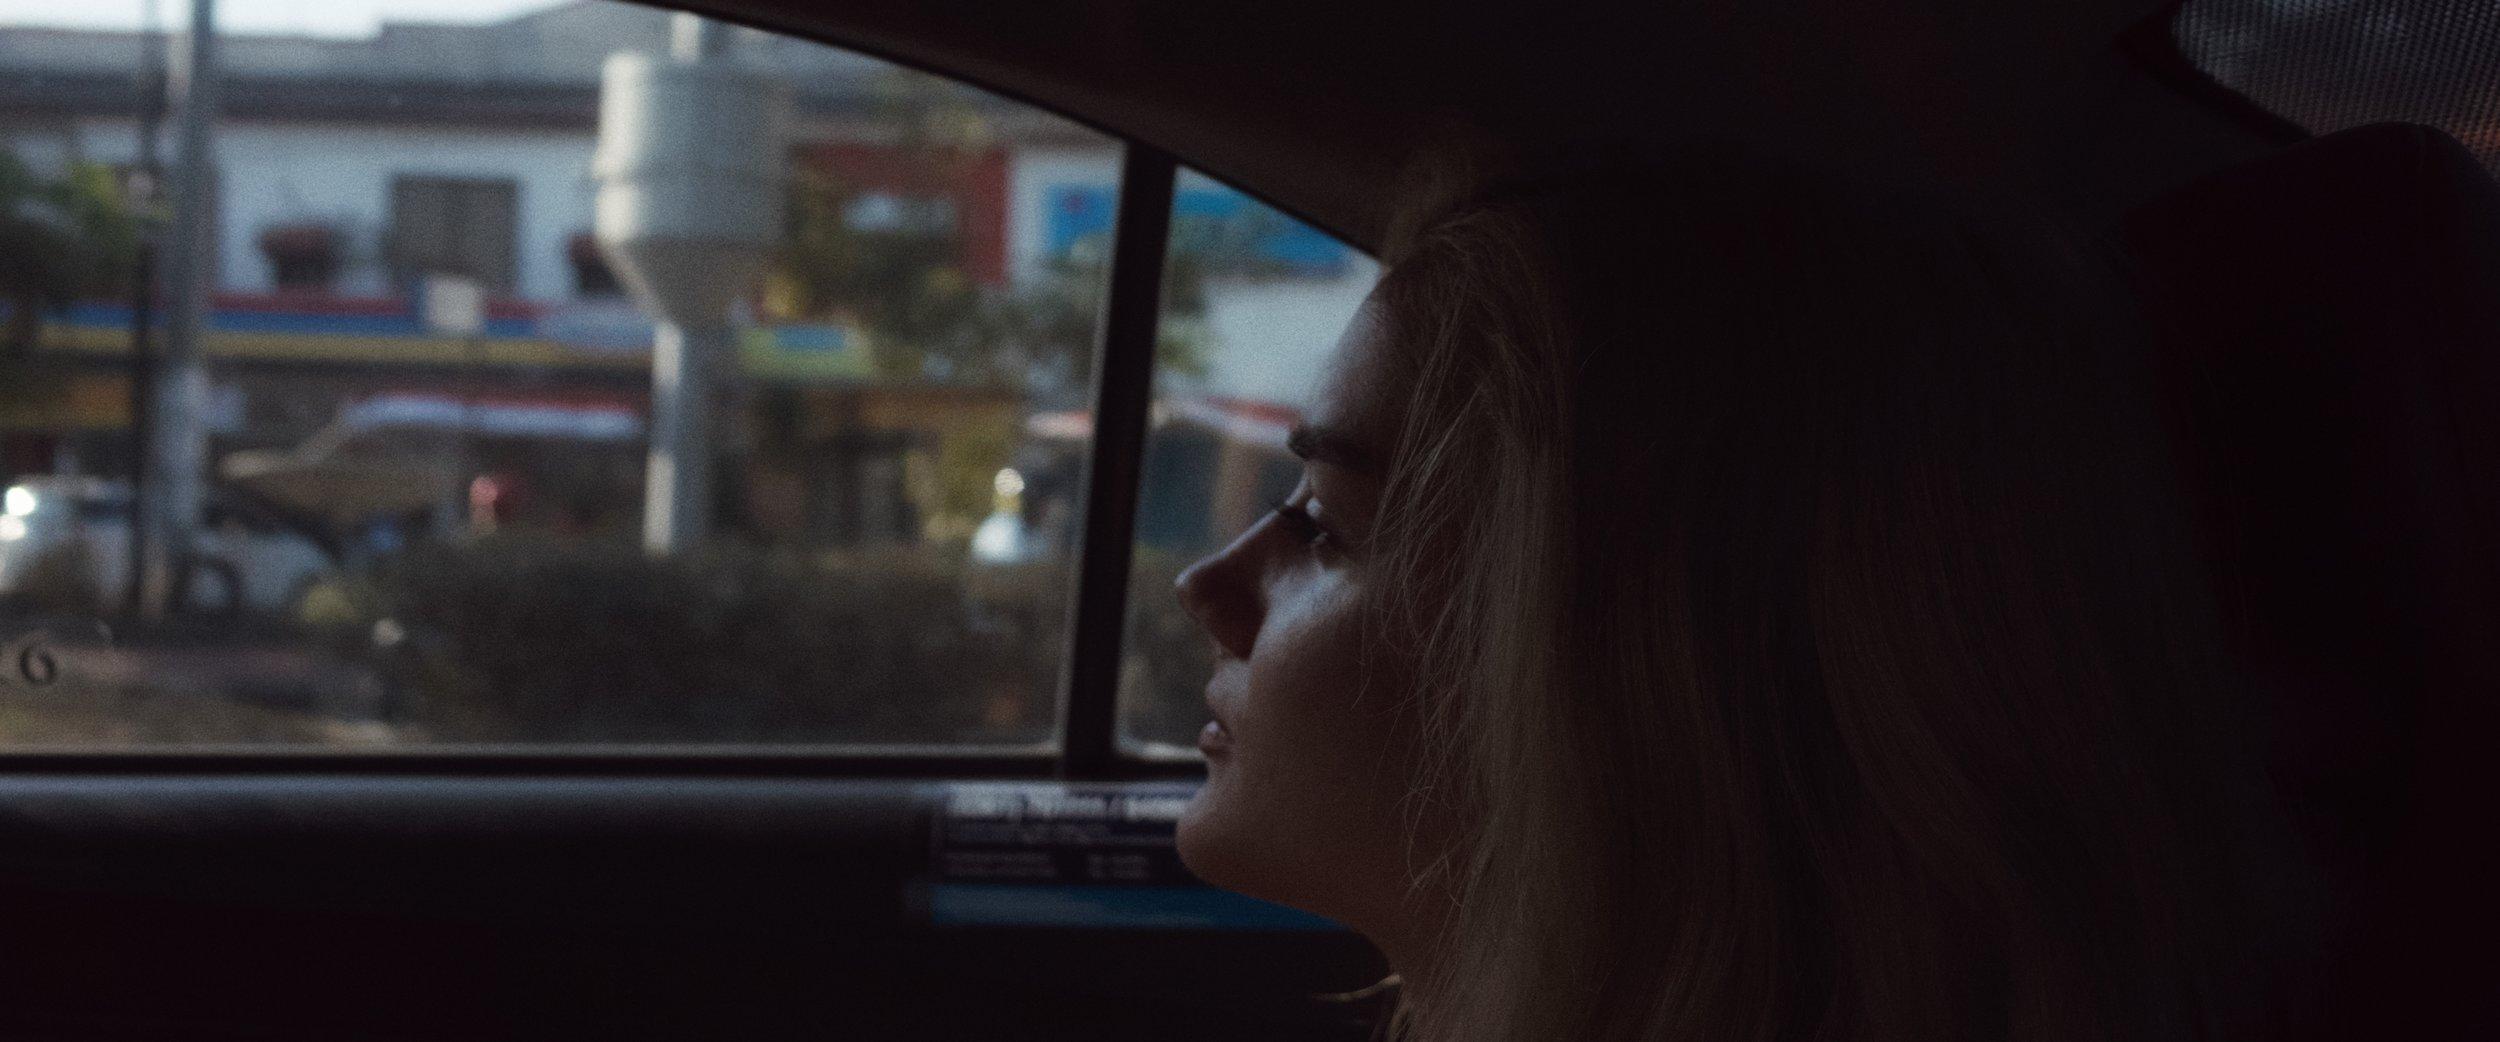 taxi ride by jevgenij tichonov.JPG